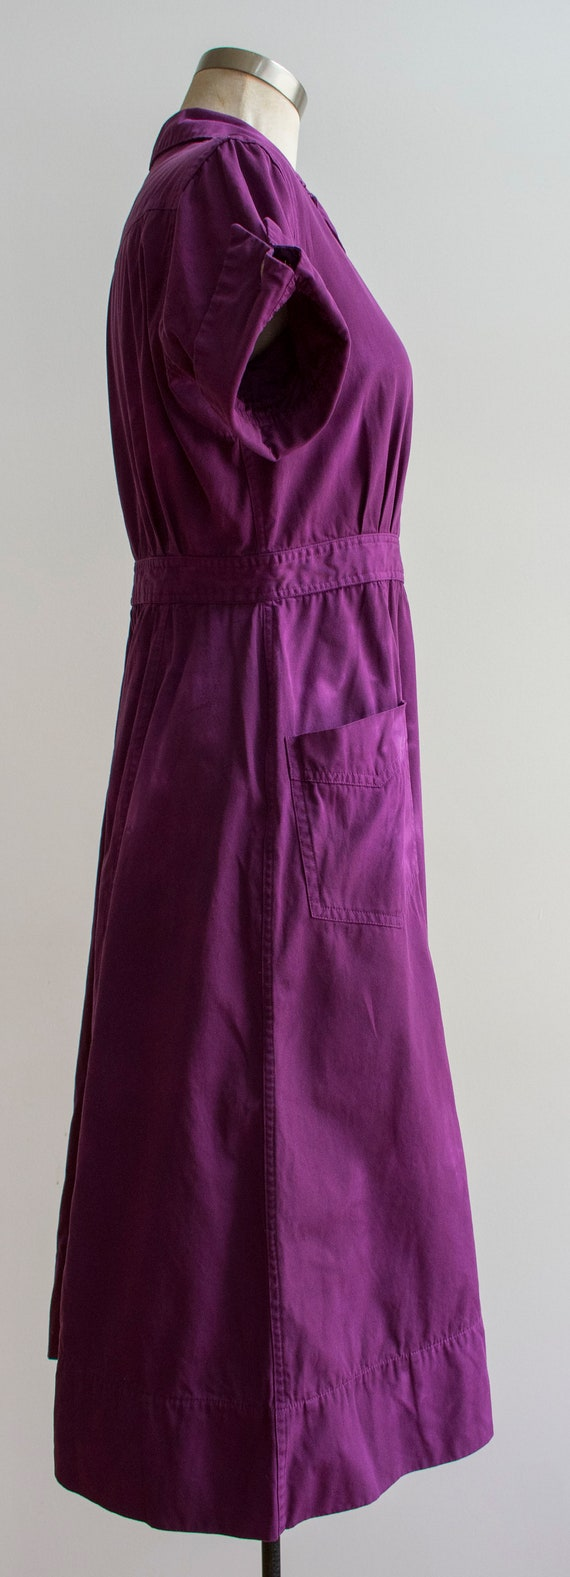 1960s Uniform Dress / Hand Dyed Purple Dress / Pu… - image 6